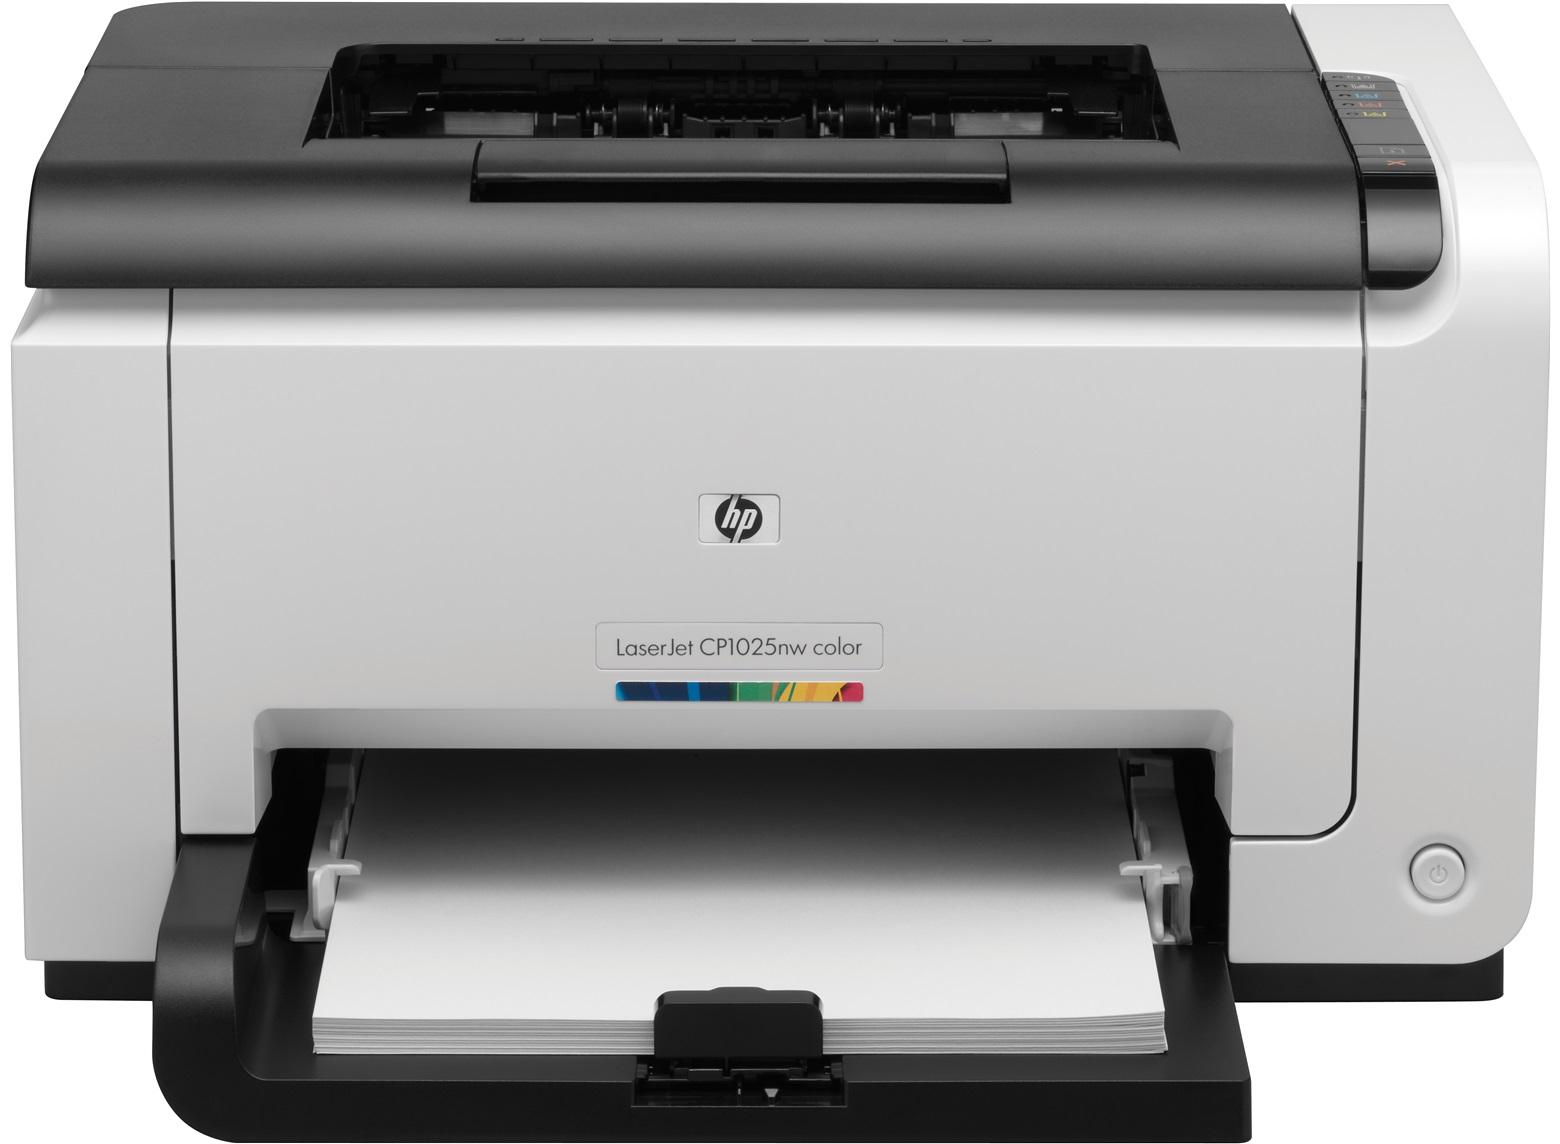 Tiskárna HP LaserJet Pro Color CP1025nw A4 bar/4str| USB| LAN| WIFI| 4,23 Kč/str